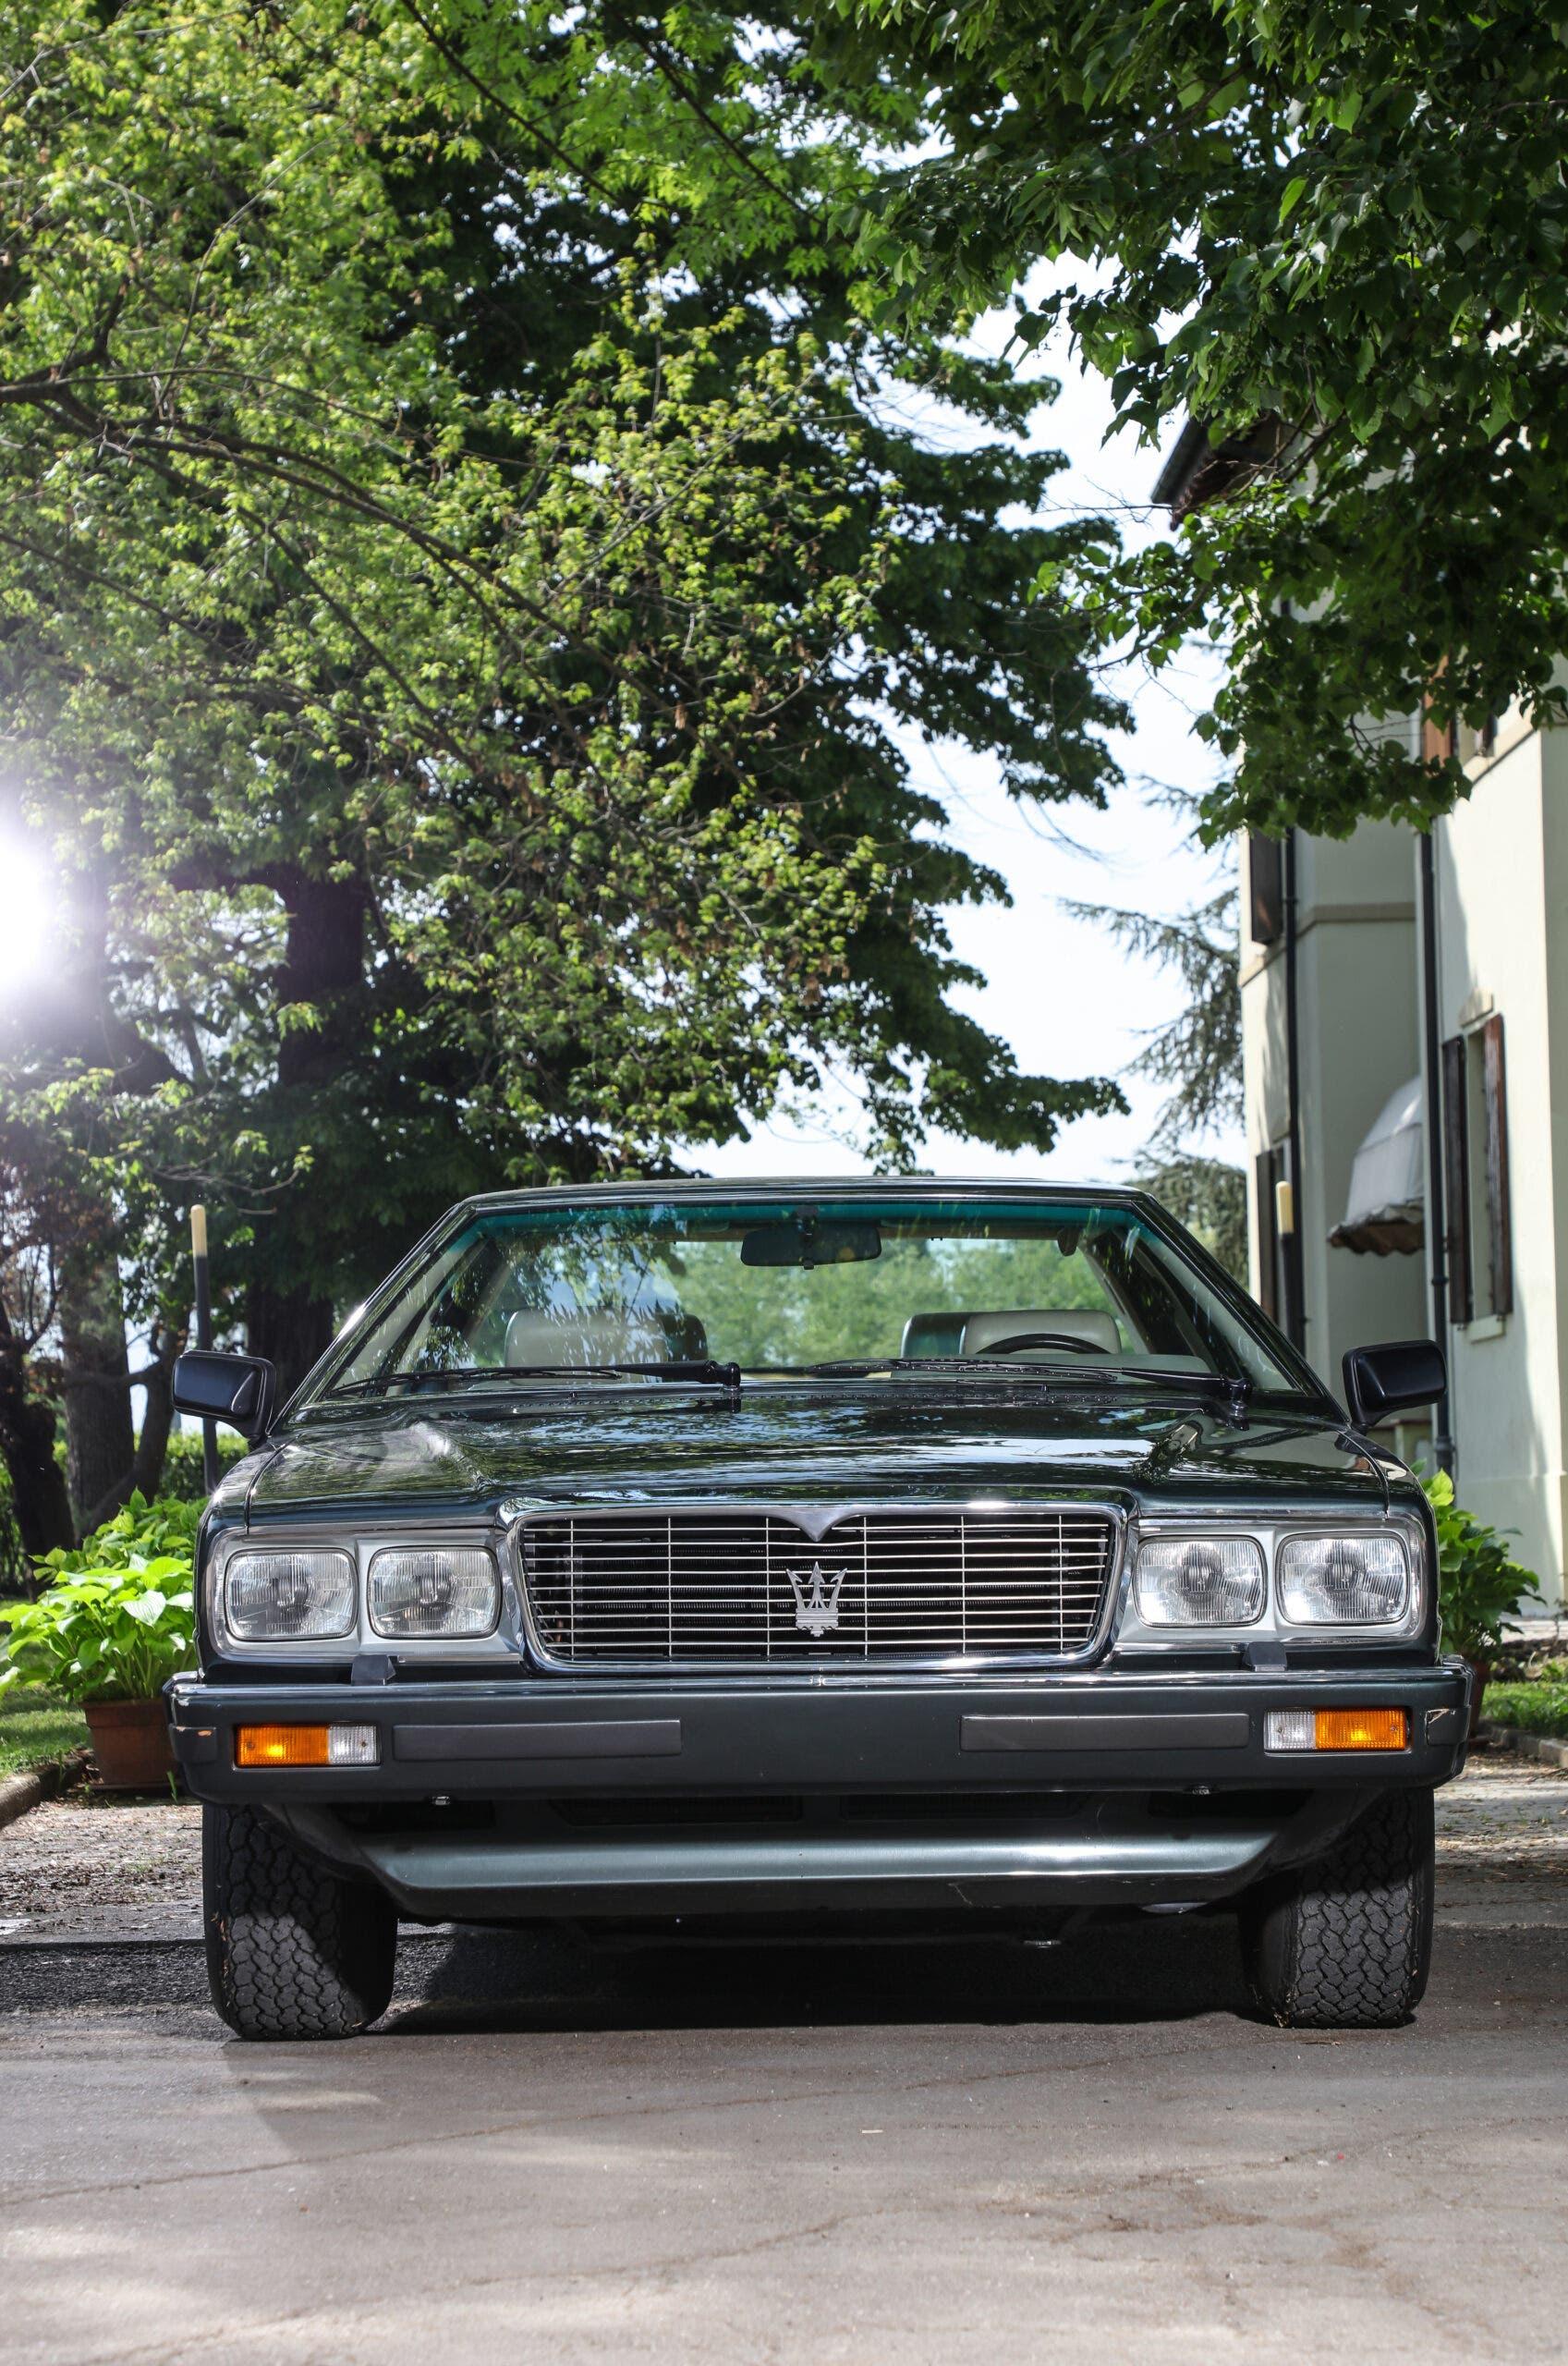 Maserati Quattroporte III generazione